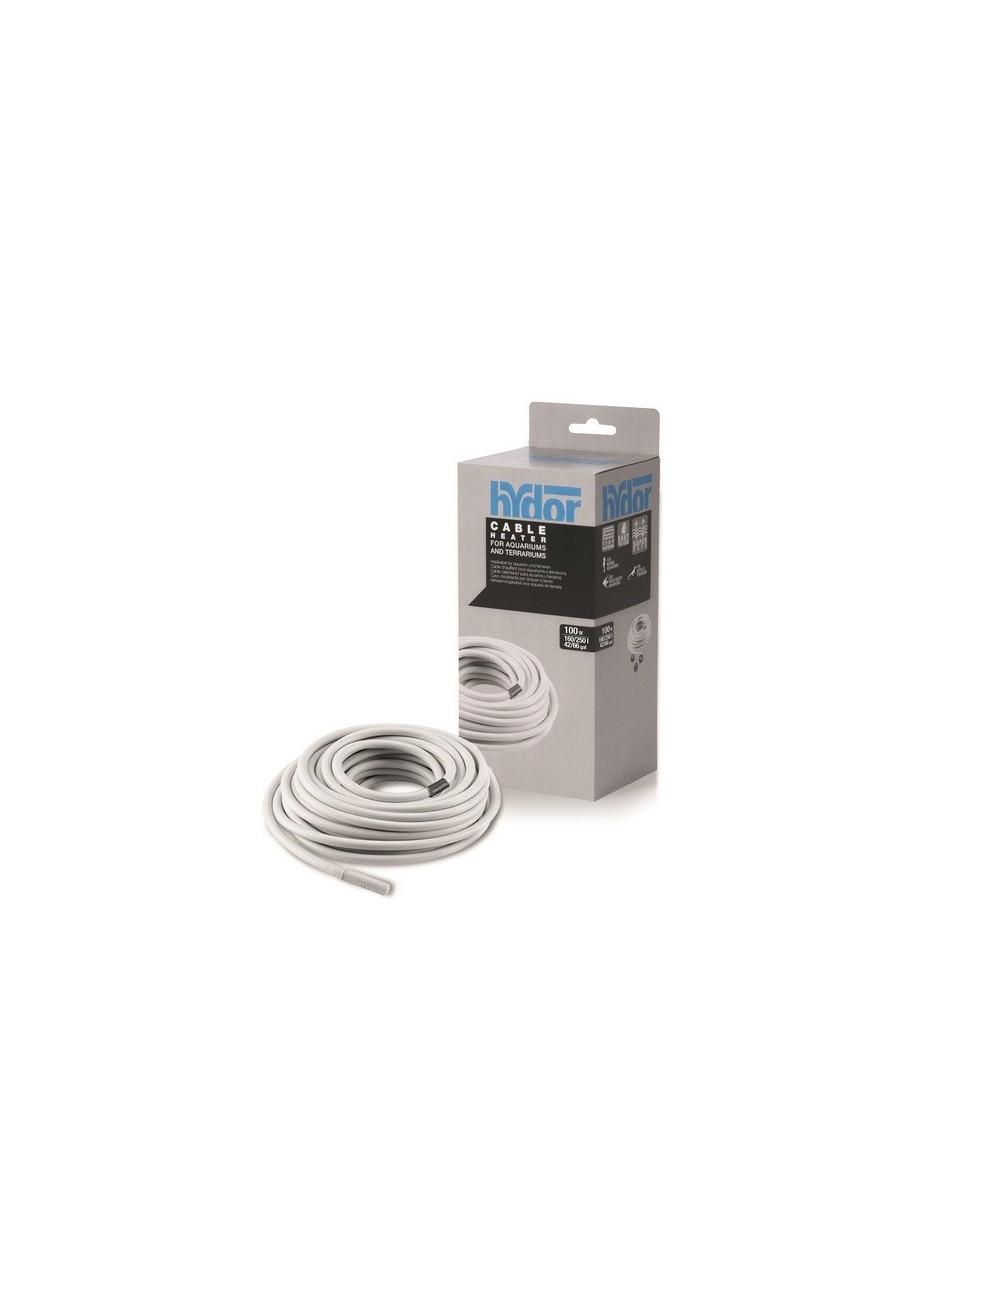 HYDOR - Hydro Kable - 50w - Câble chauffant pour aquarium